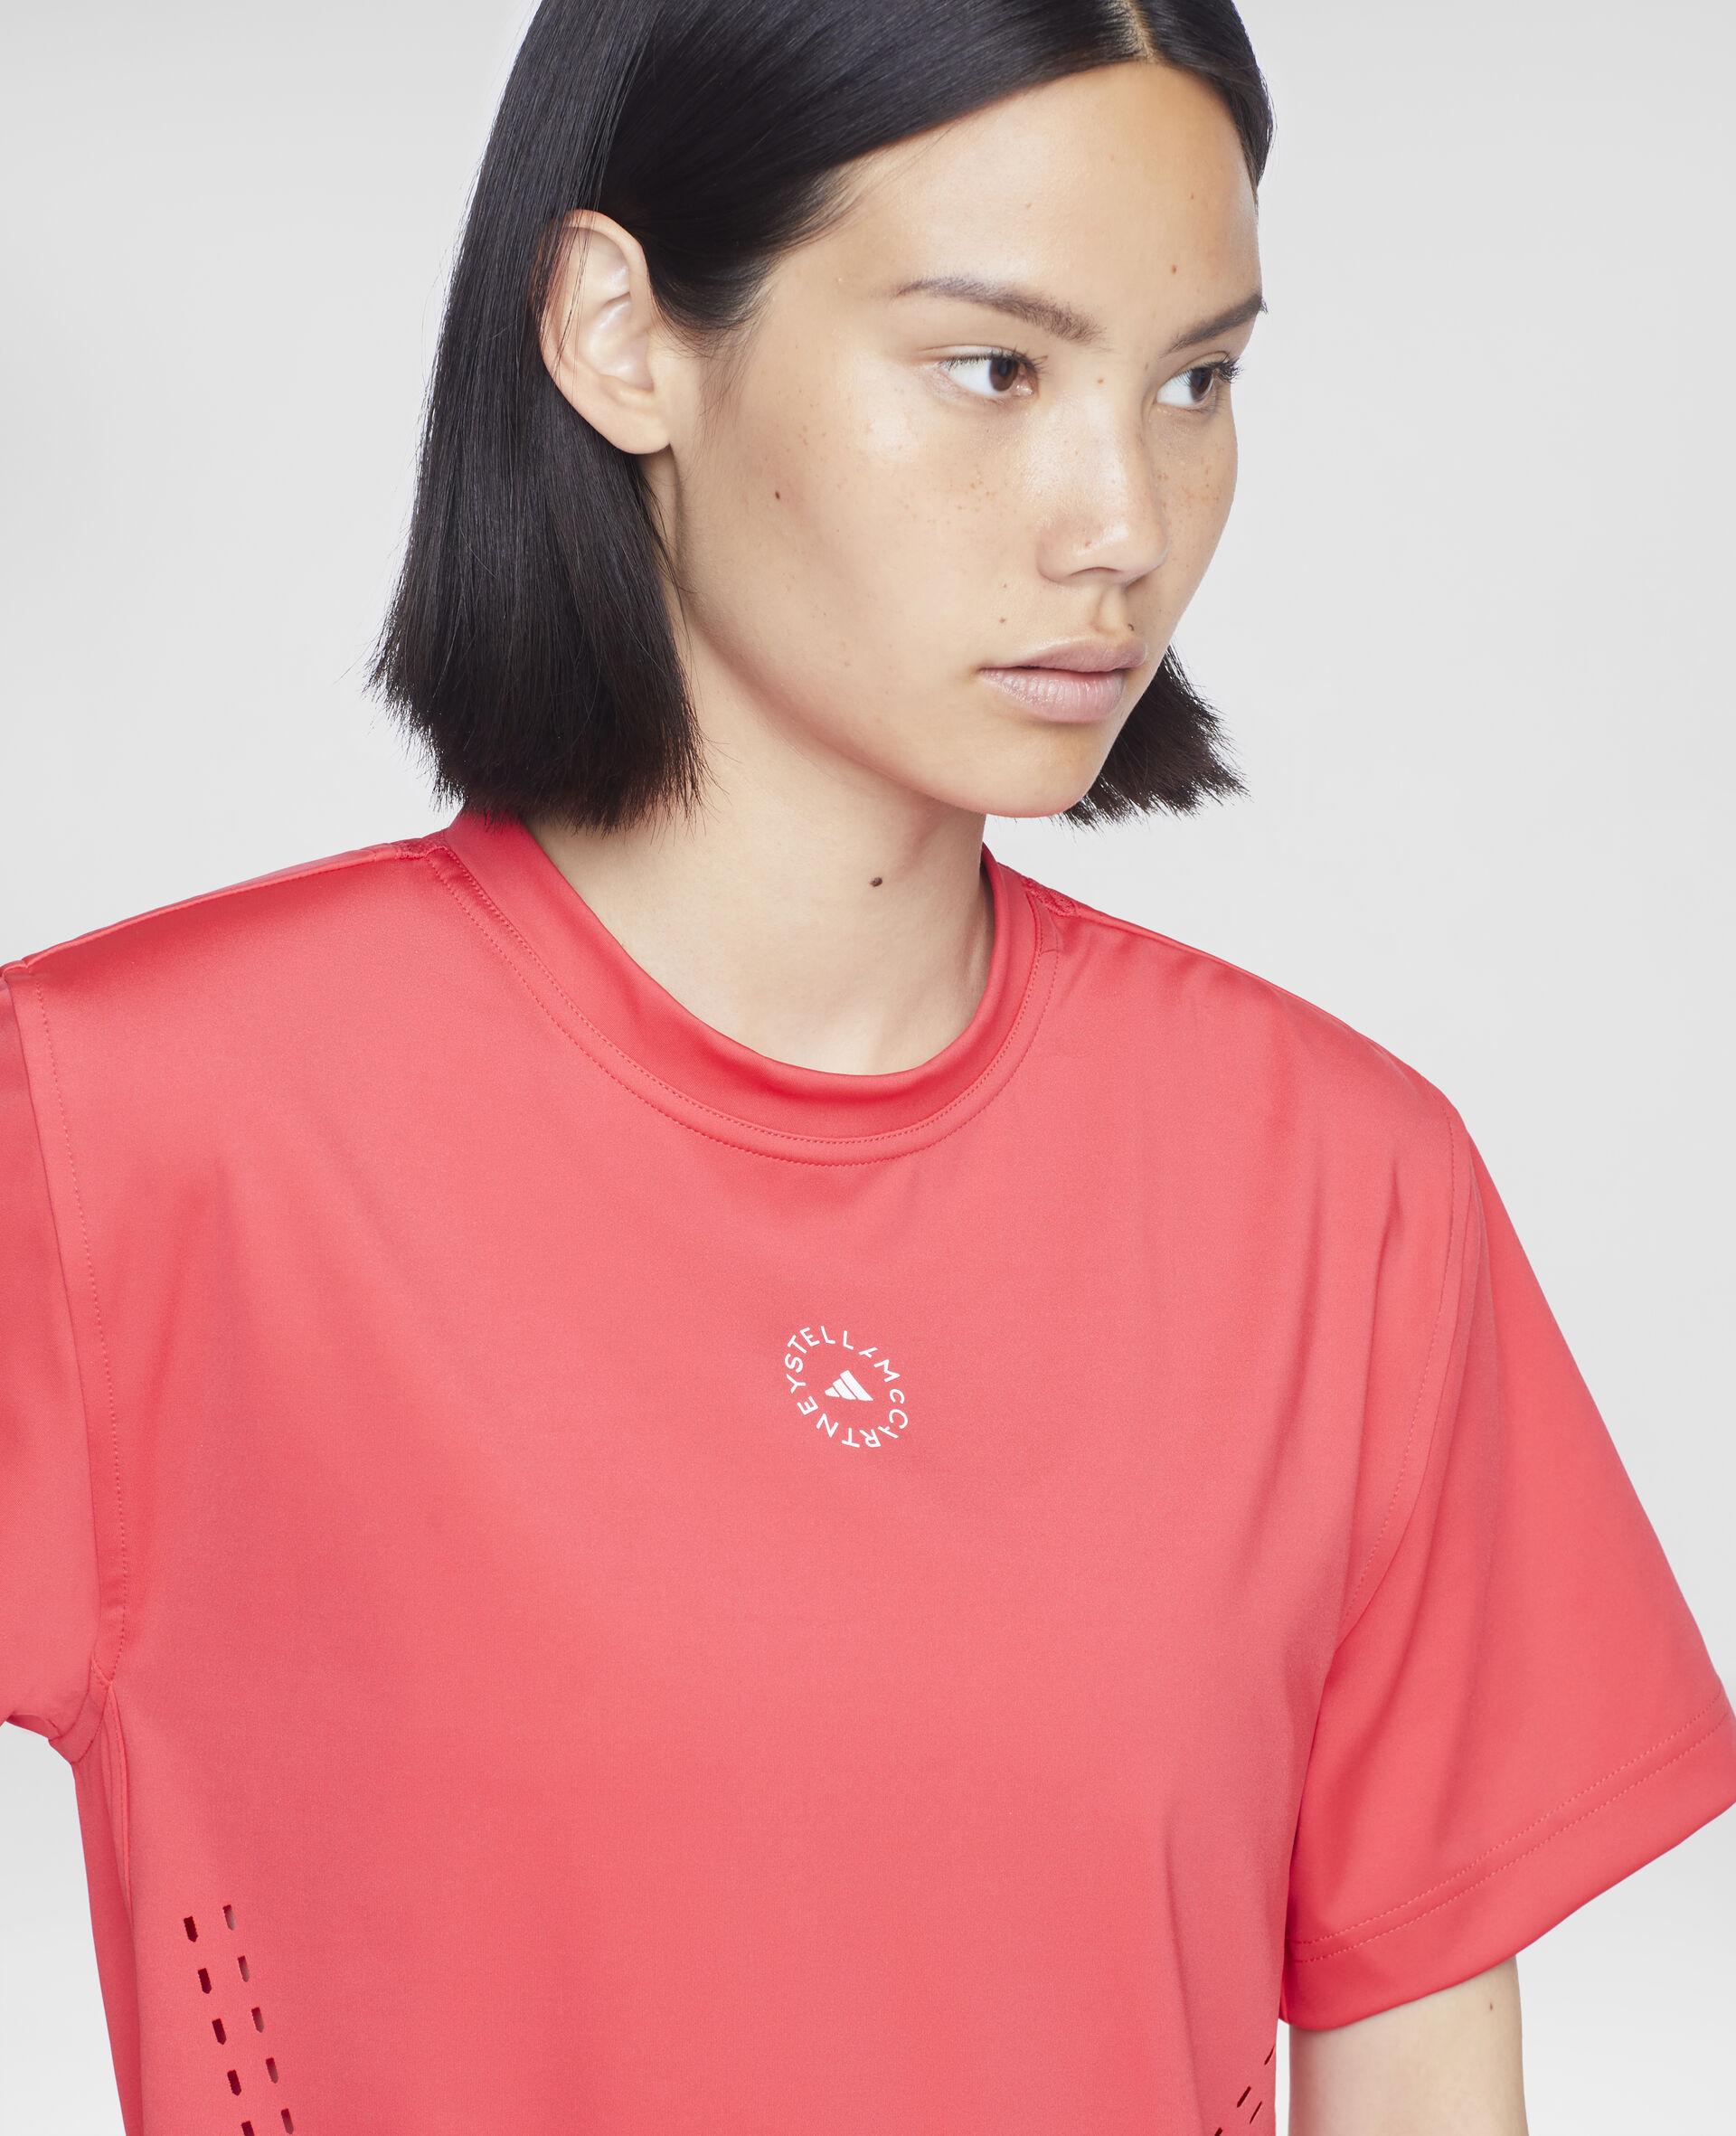 Active Pink Training T-shirt-Pink-large image number 3